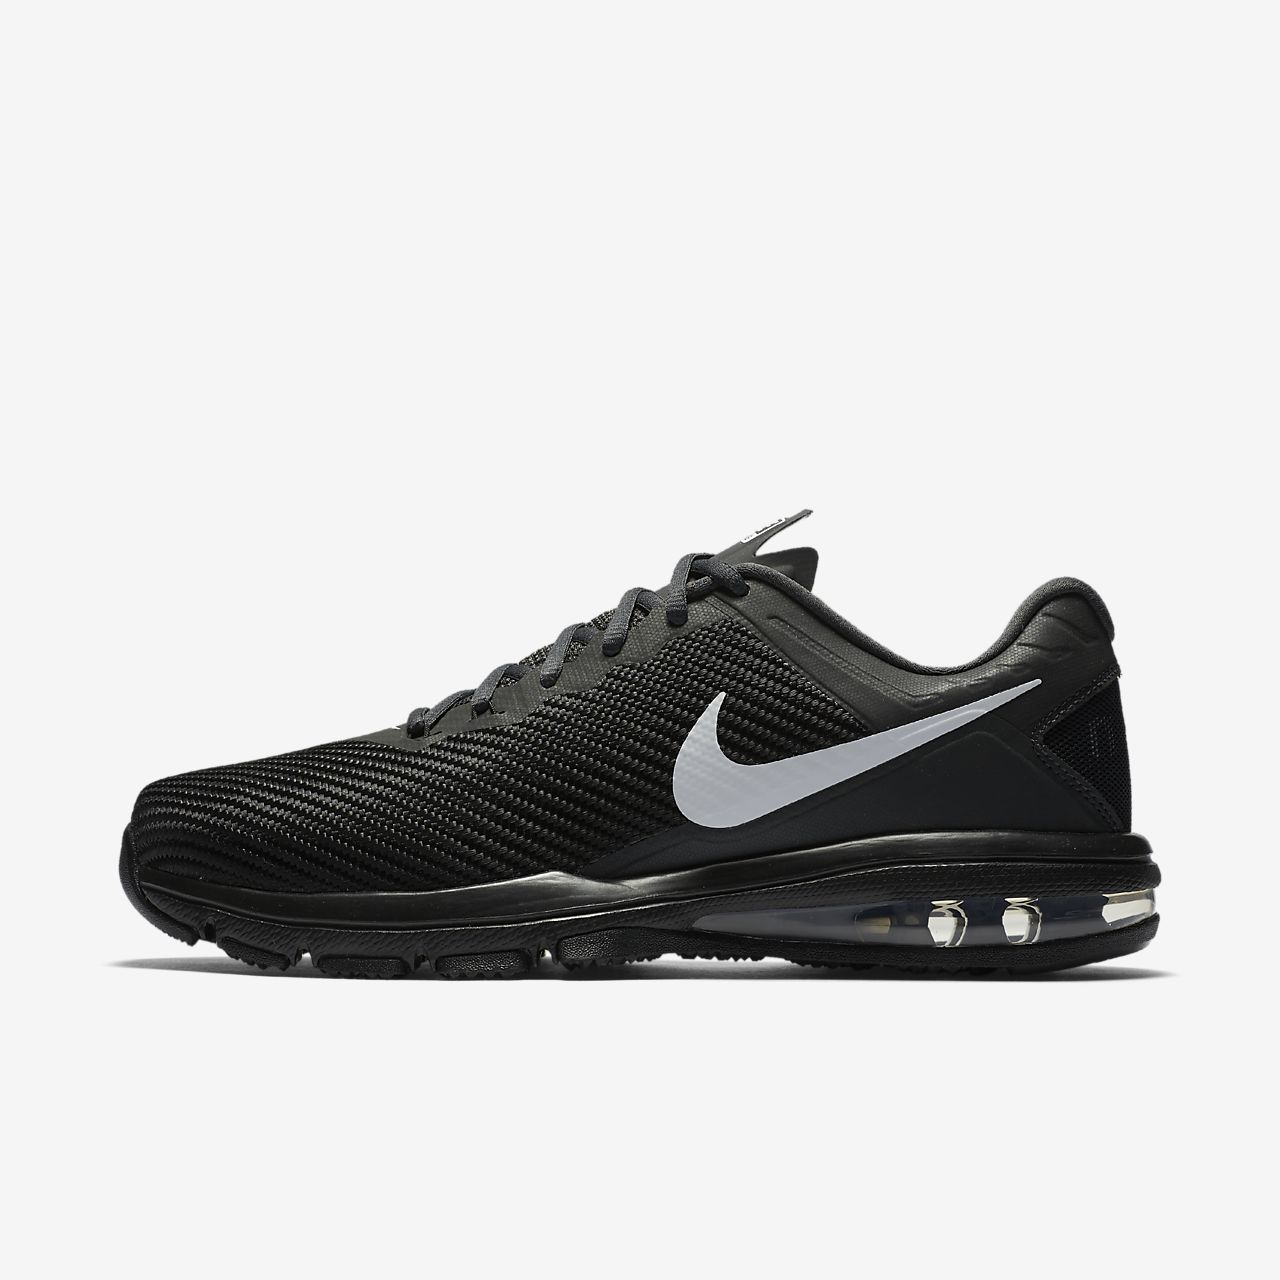 on sale 9e875 c63d1 ... Chaussure de training Nike Air Max Full Ride TR 1.5 pour Homme